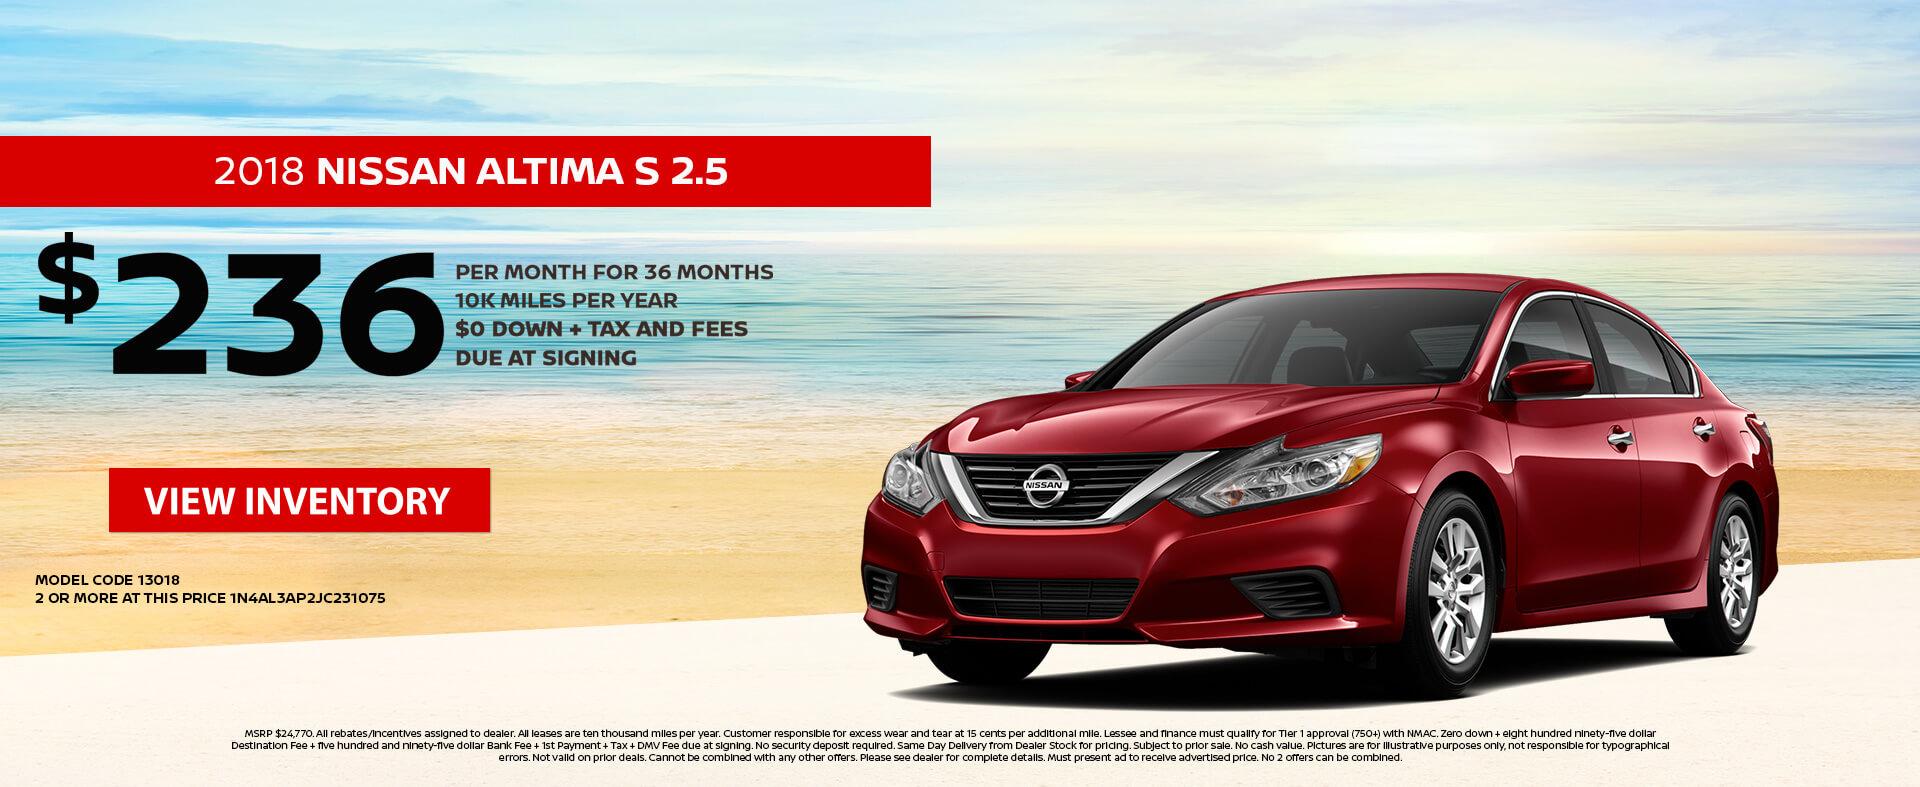 Nissan Altima $236 Lease